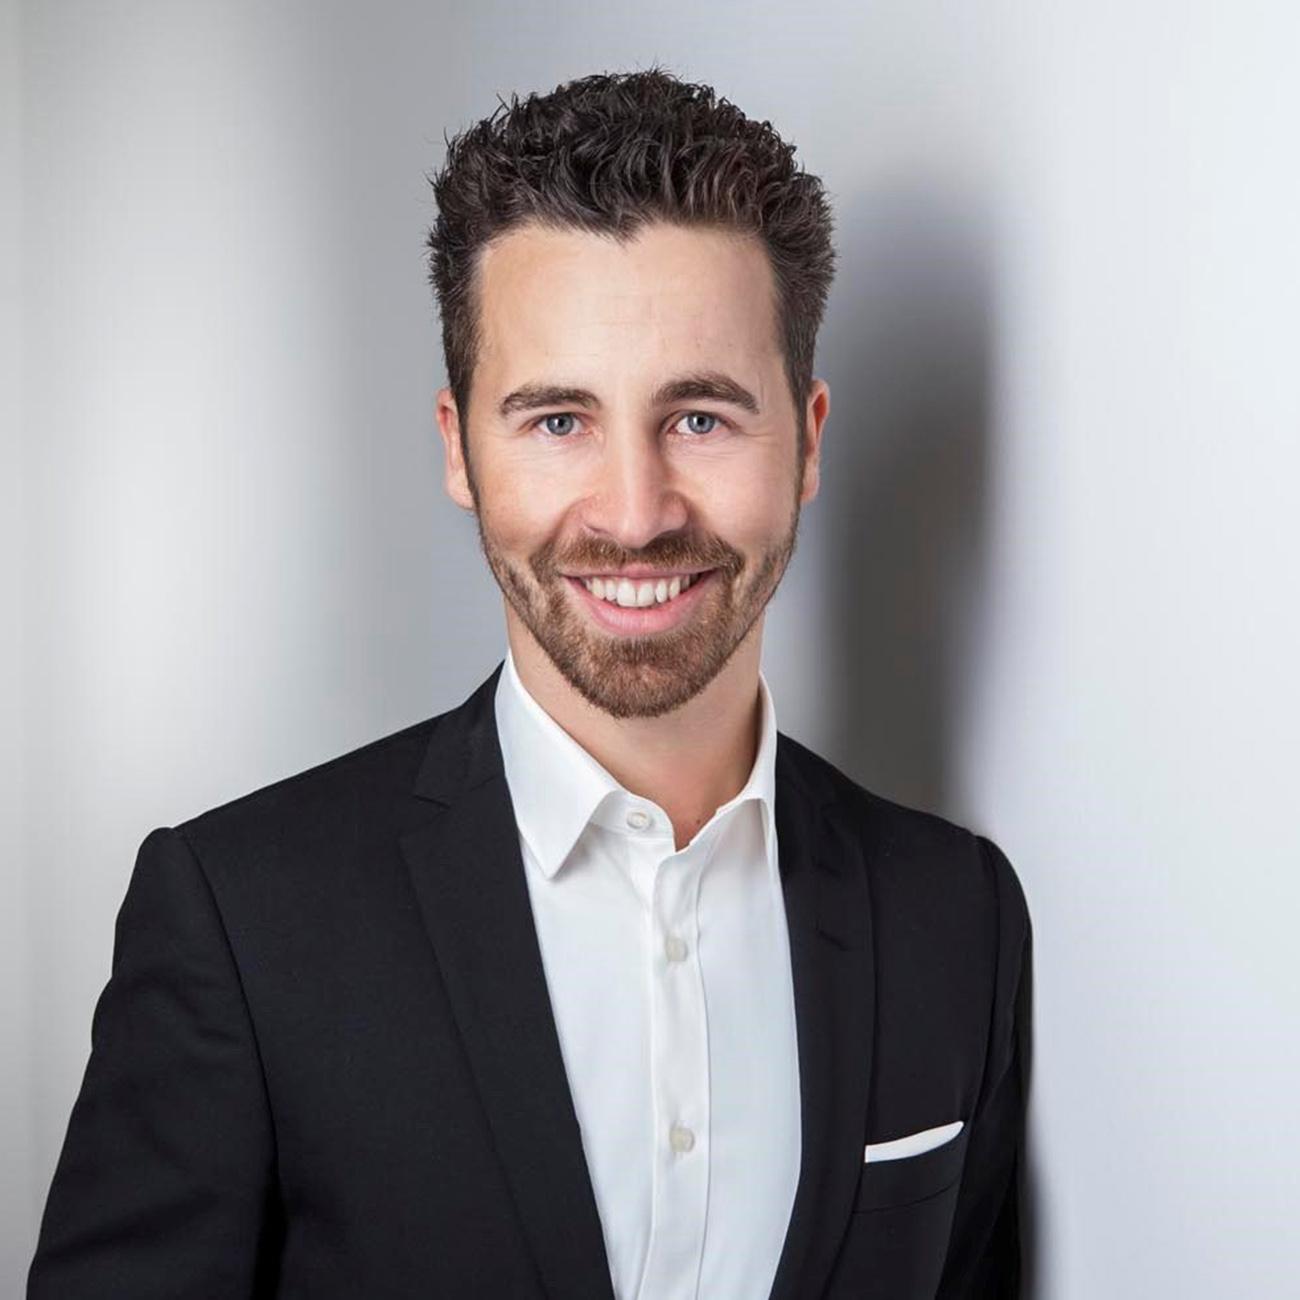 Dr. Dennis Bültmann, NETGO GmbH